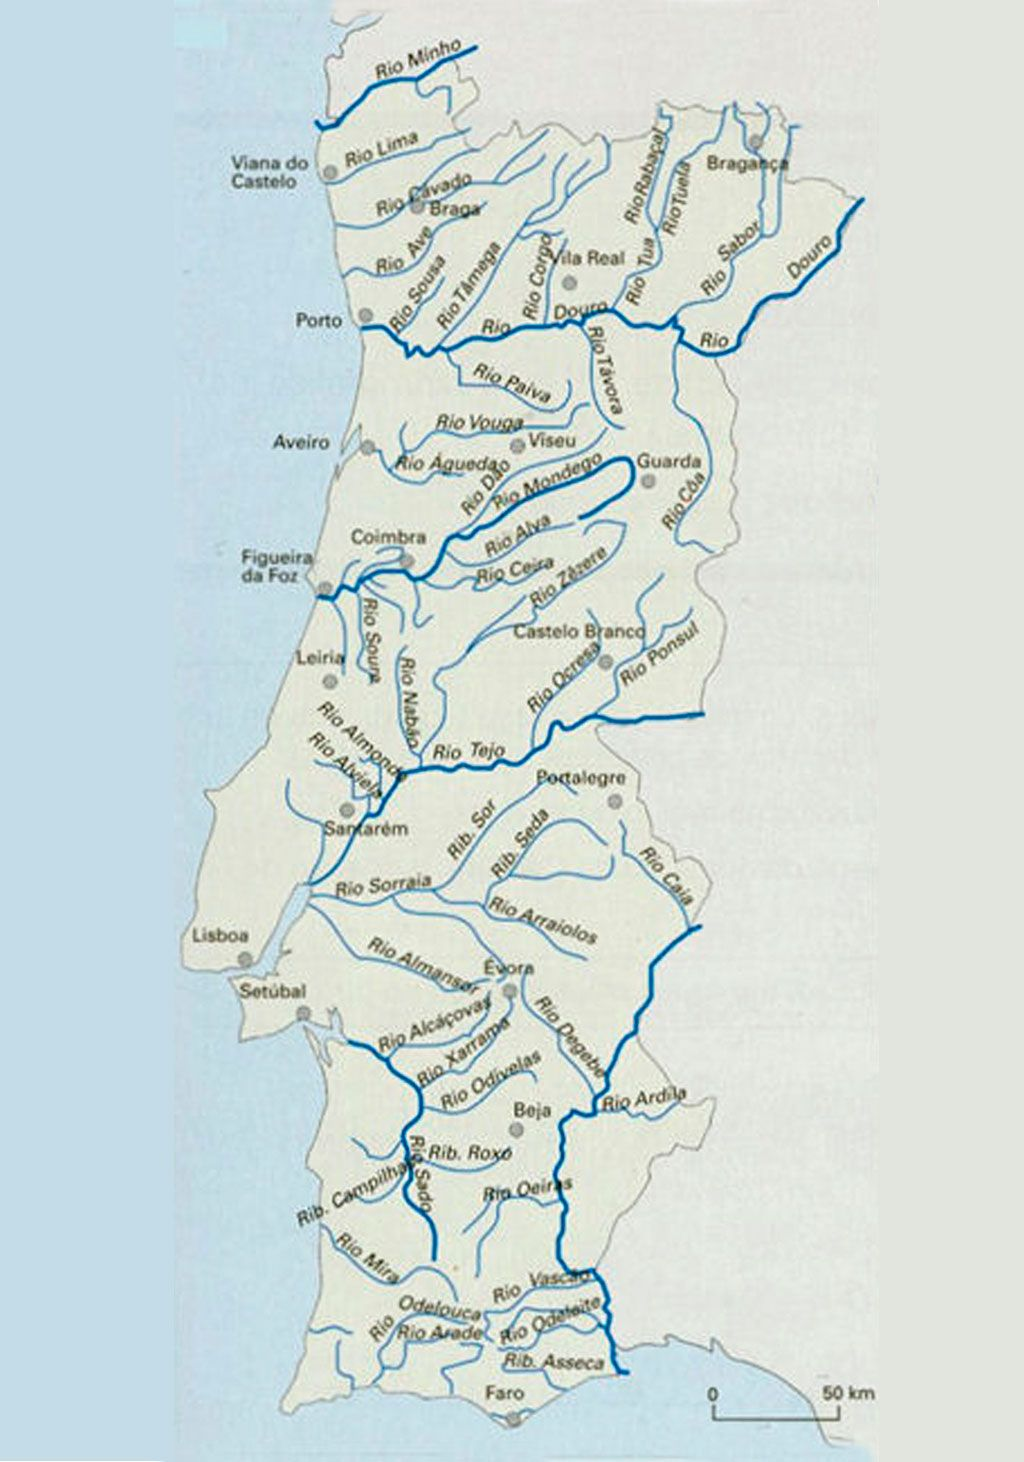 mapa de rios portugueses Mapa Rios Portugal | thujamassages mapa de rios portugueses